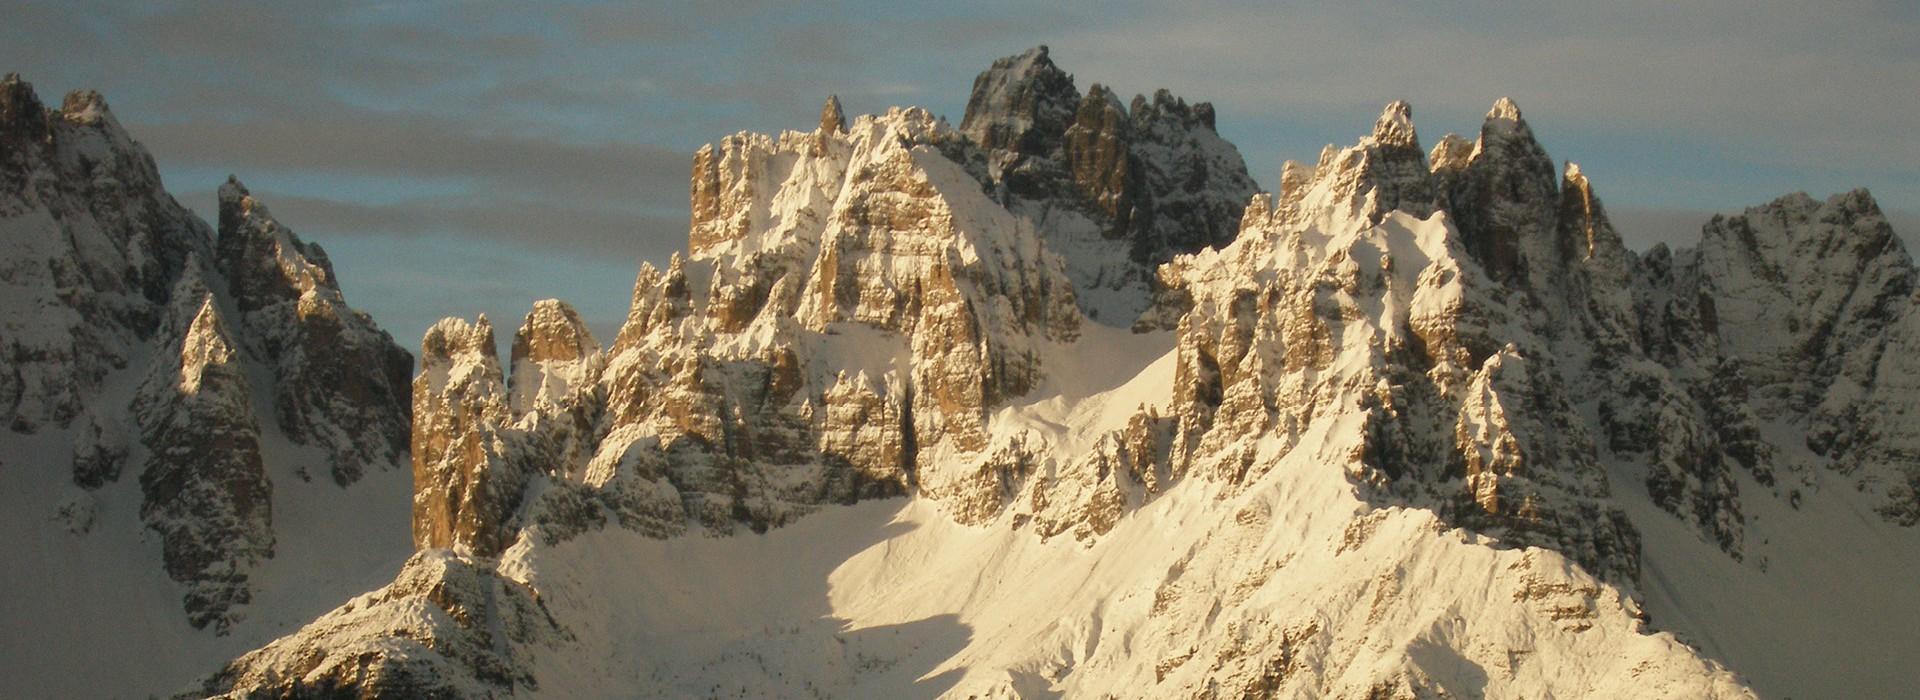 Parco Naturale Dolomiti Friulane UNESCO